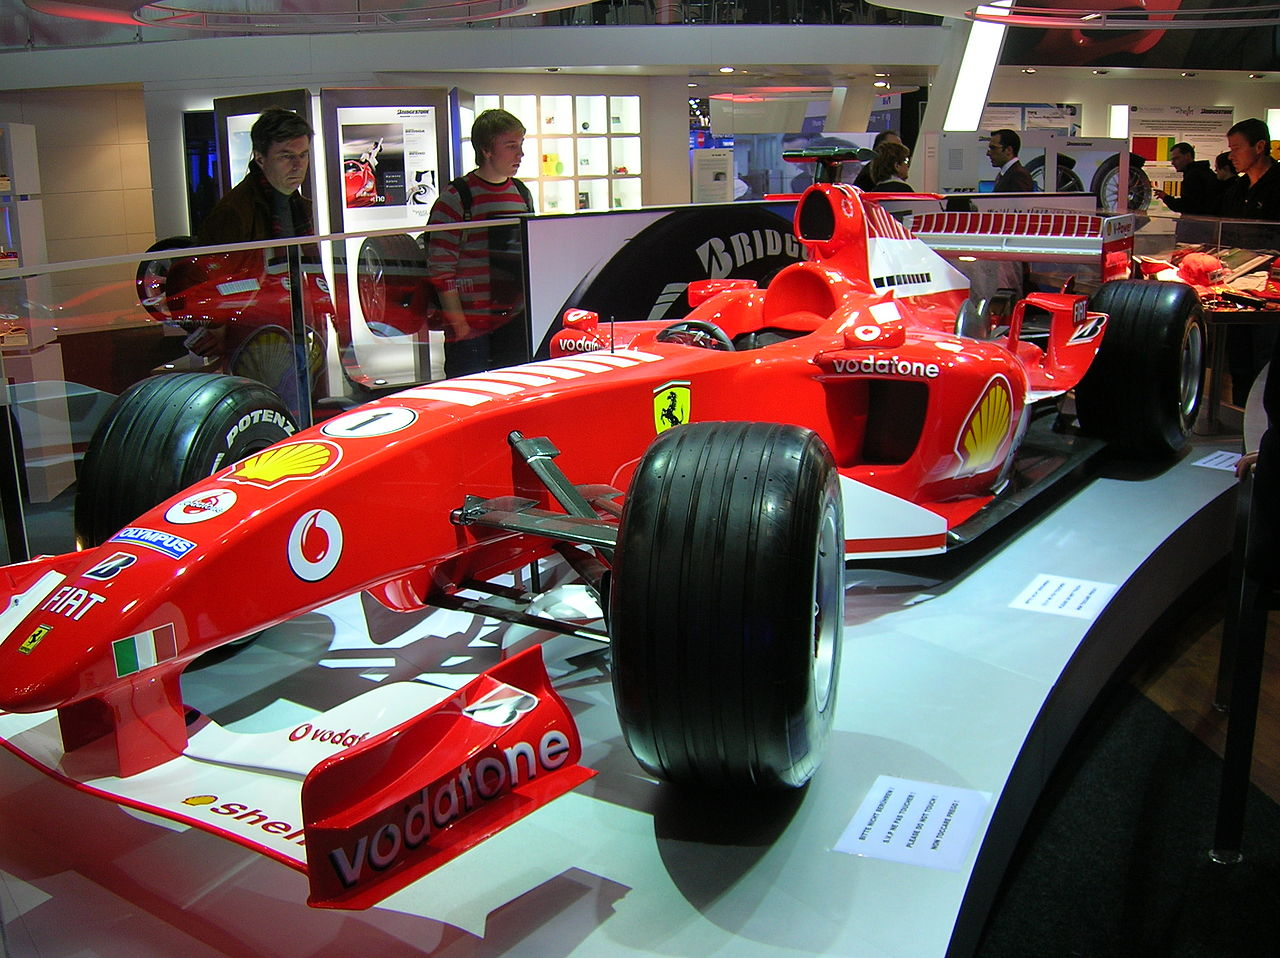 File 2006 Sag F1 Ferrari 2005 01 Jpg Wikimedia Commons